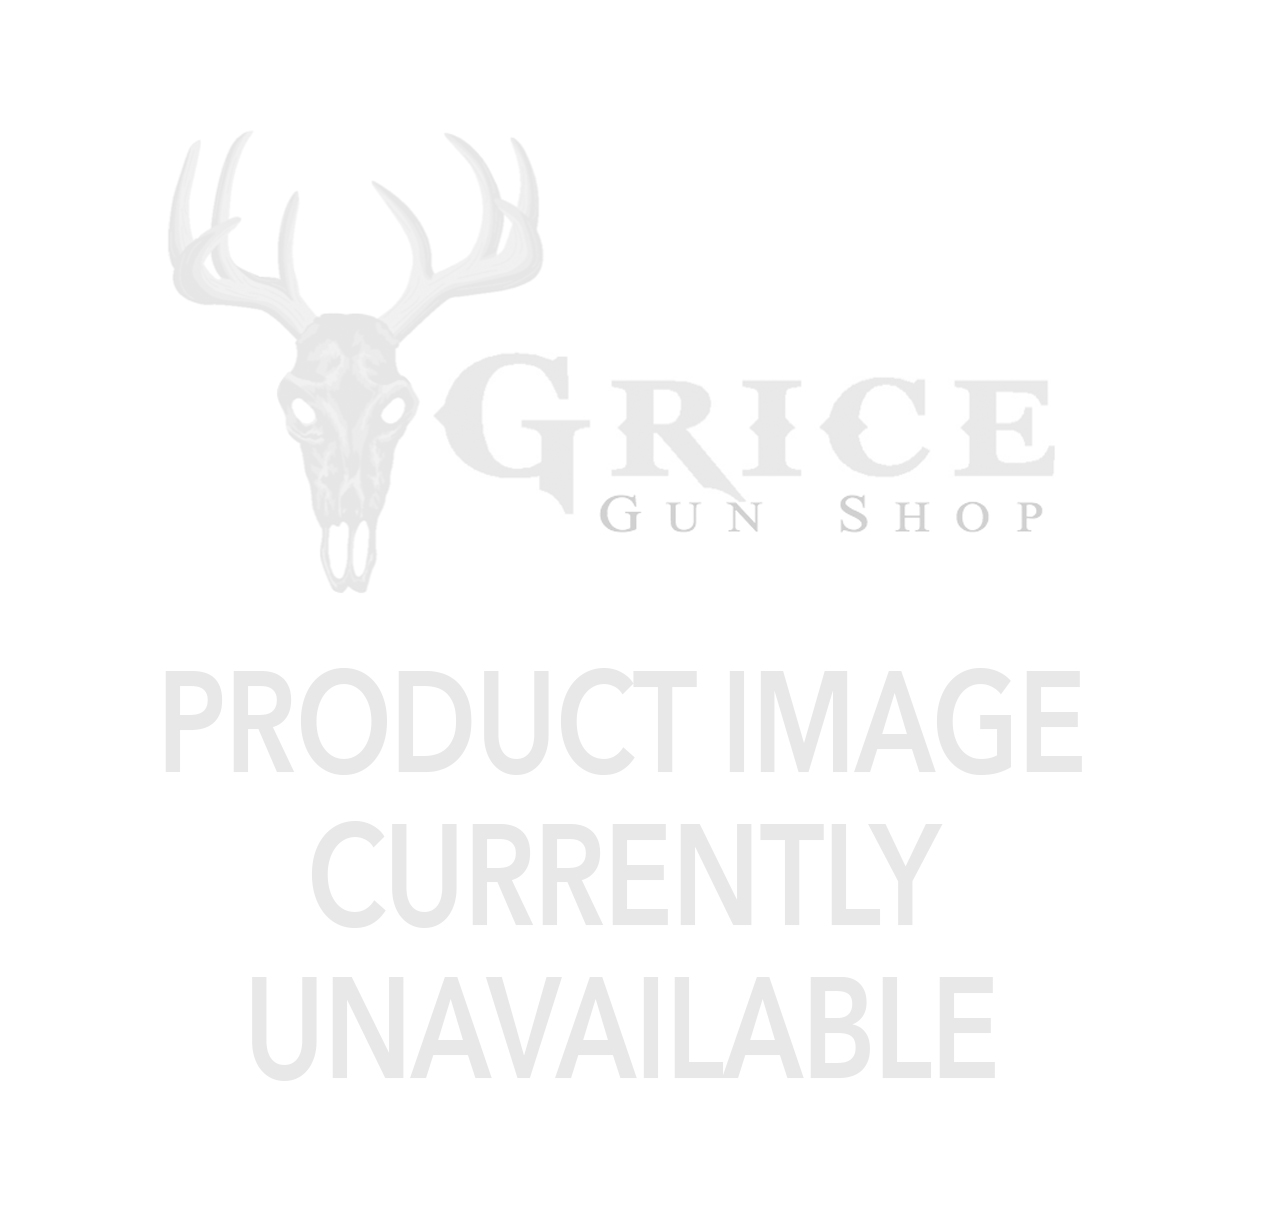 Hornady- LeveRevolution 307Win 160gr FTX